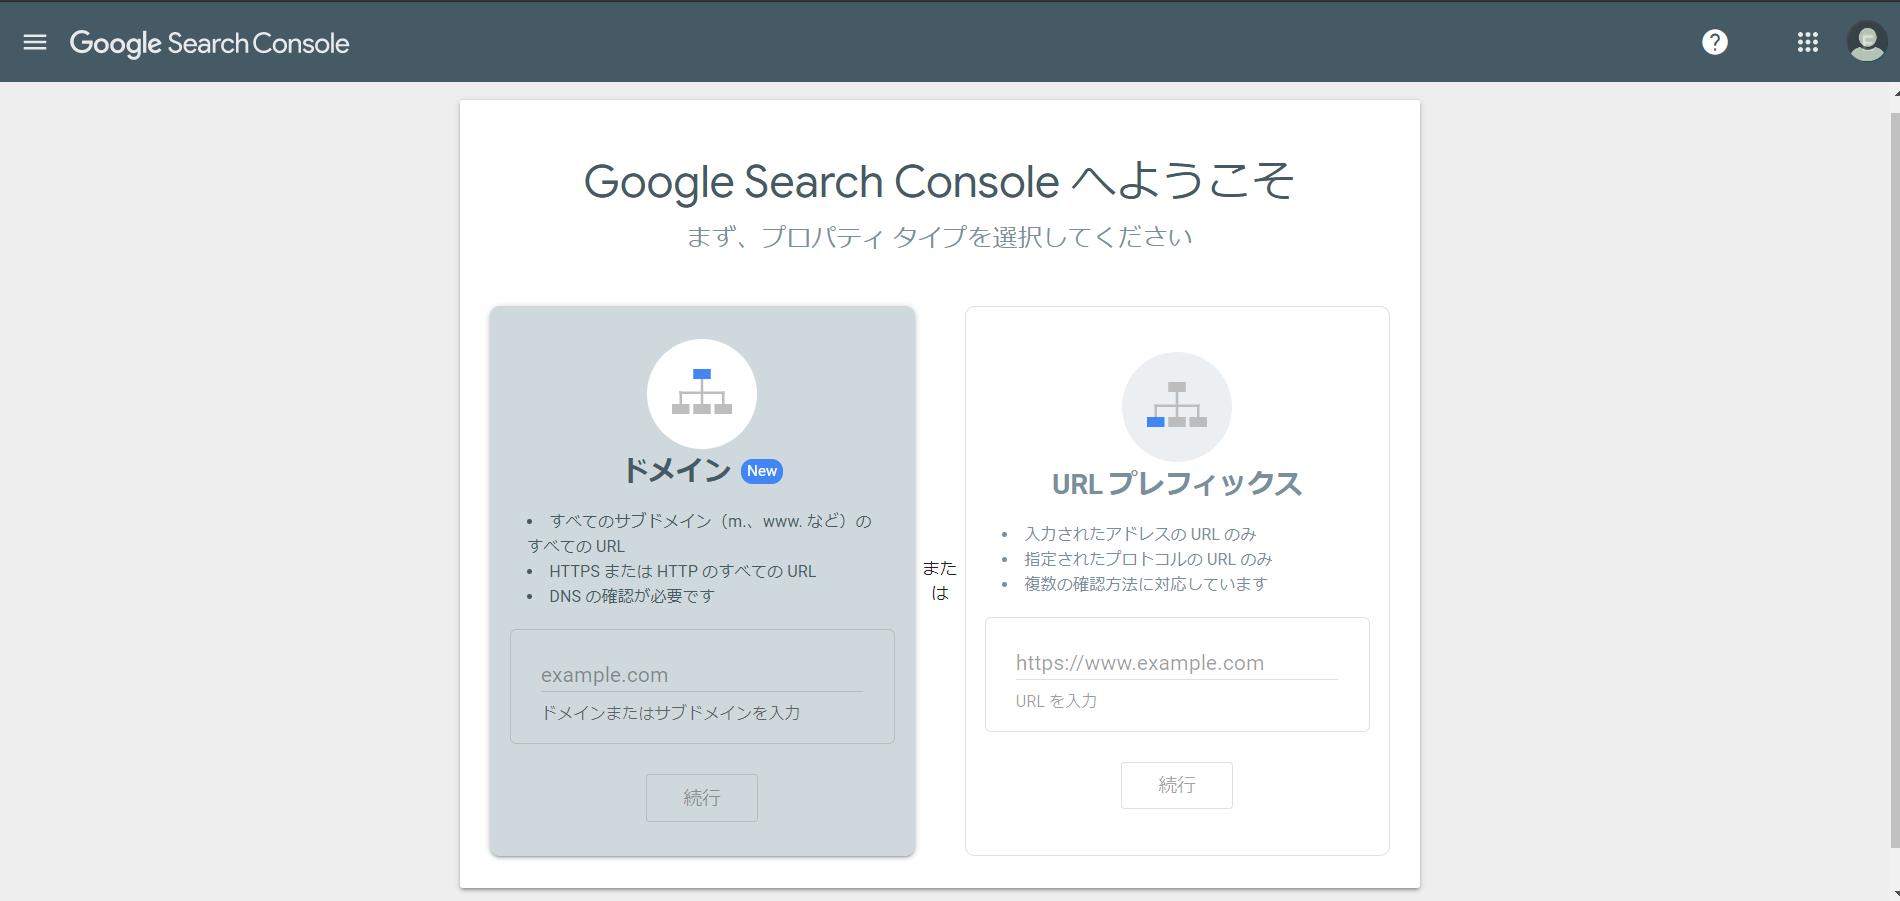 WordPressブログにGoogleサーチコンソールを設定する手順2